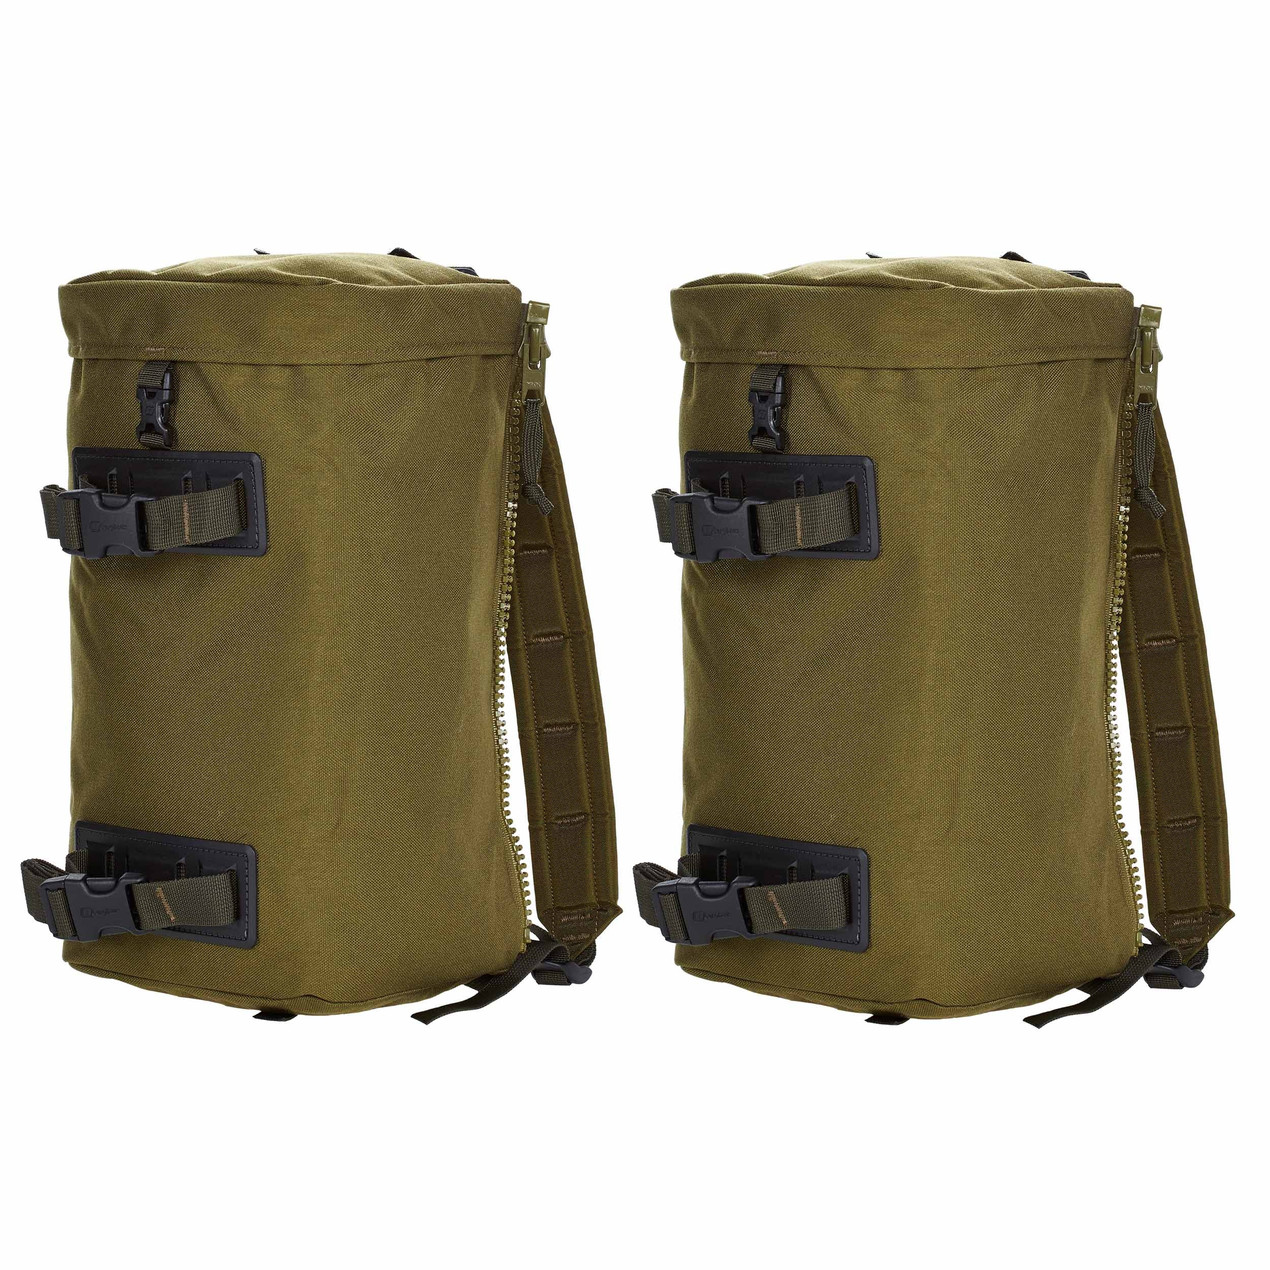 Berghaus MMPS Pockets II Large 2x Oliv 15 l